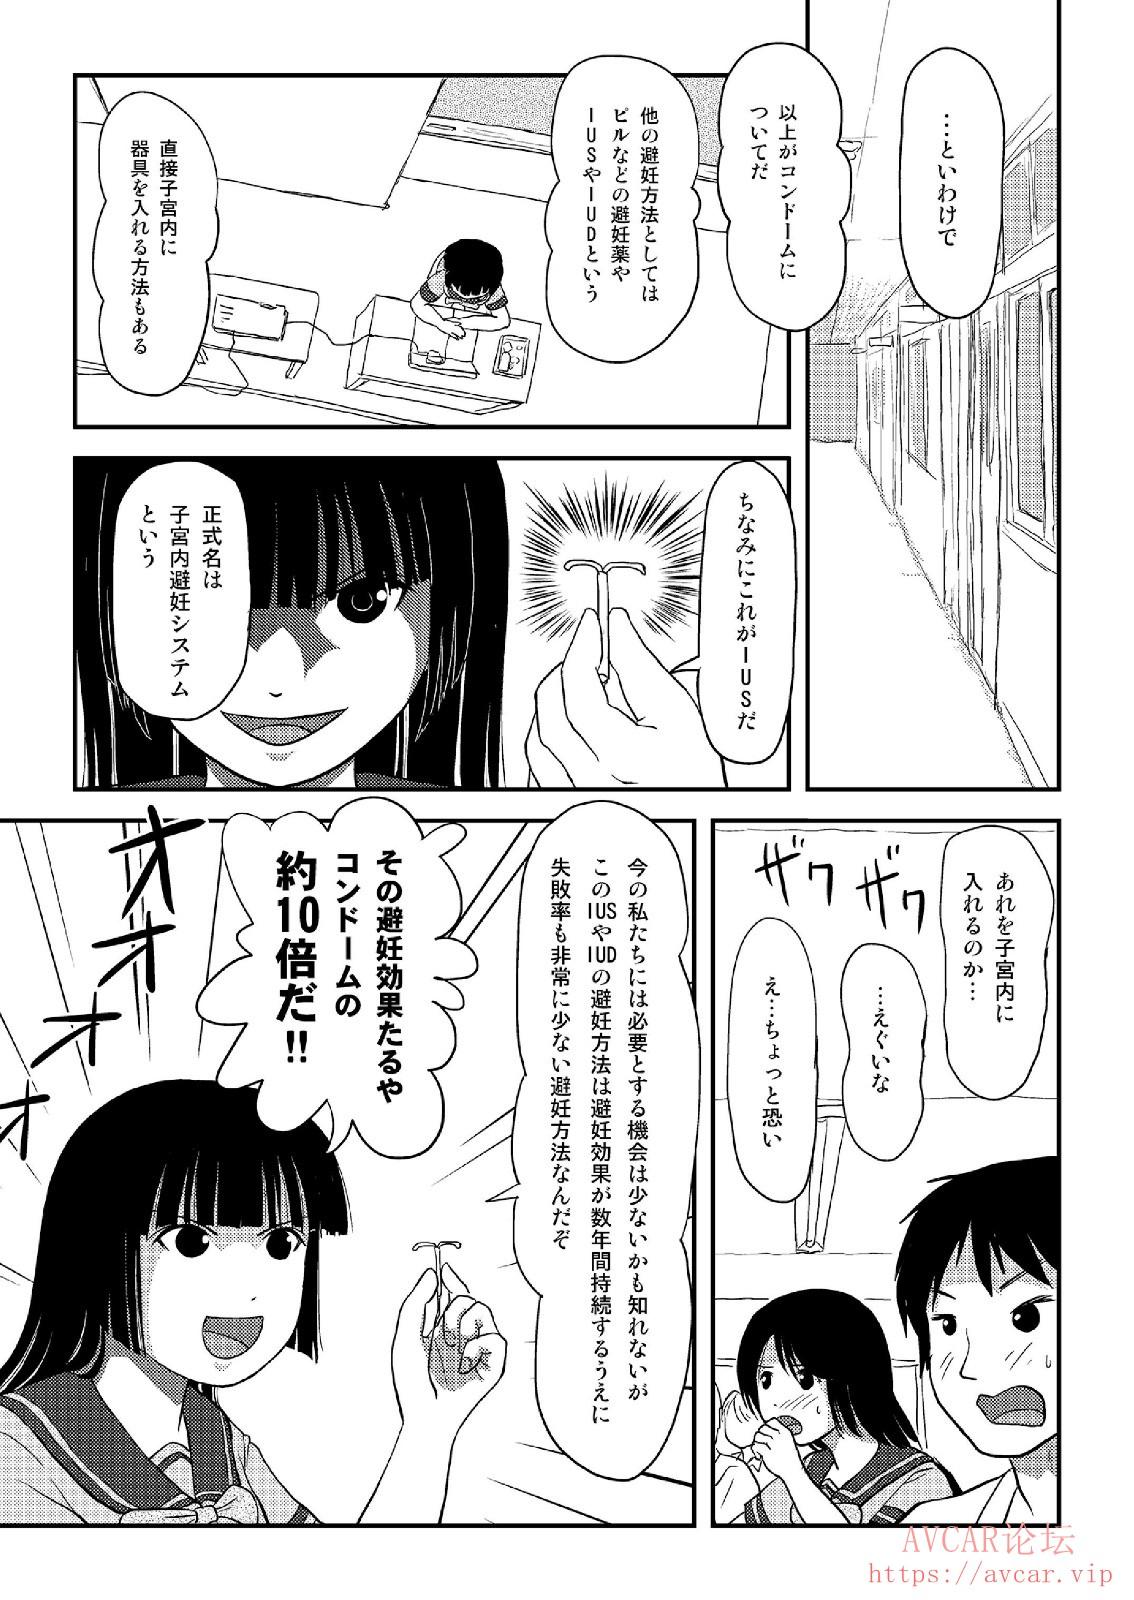 5_page_017.jpg